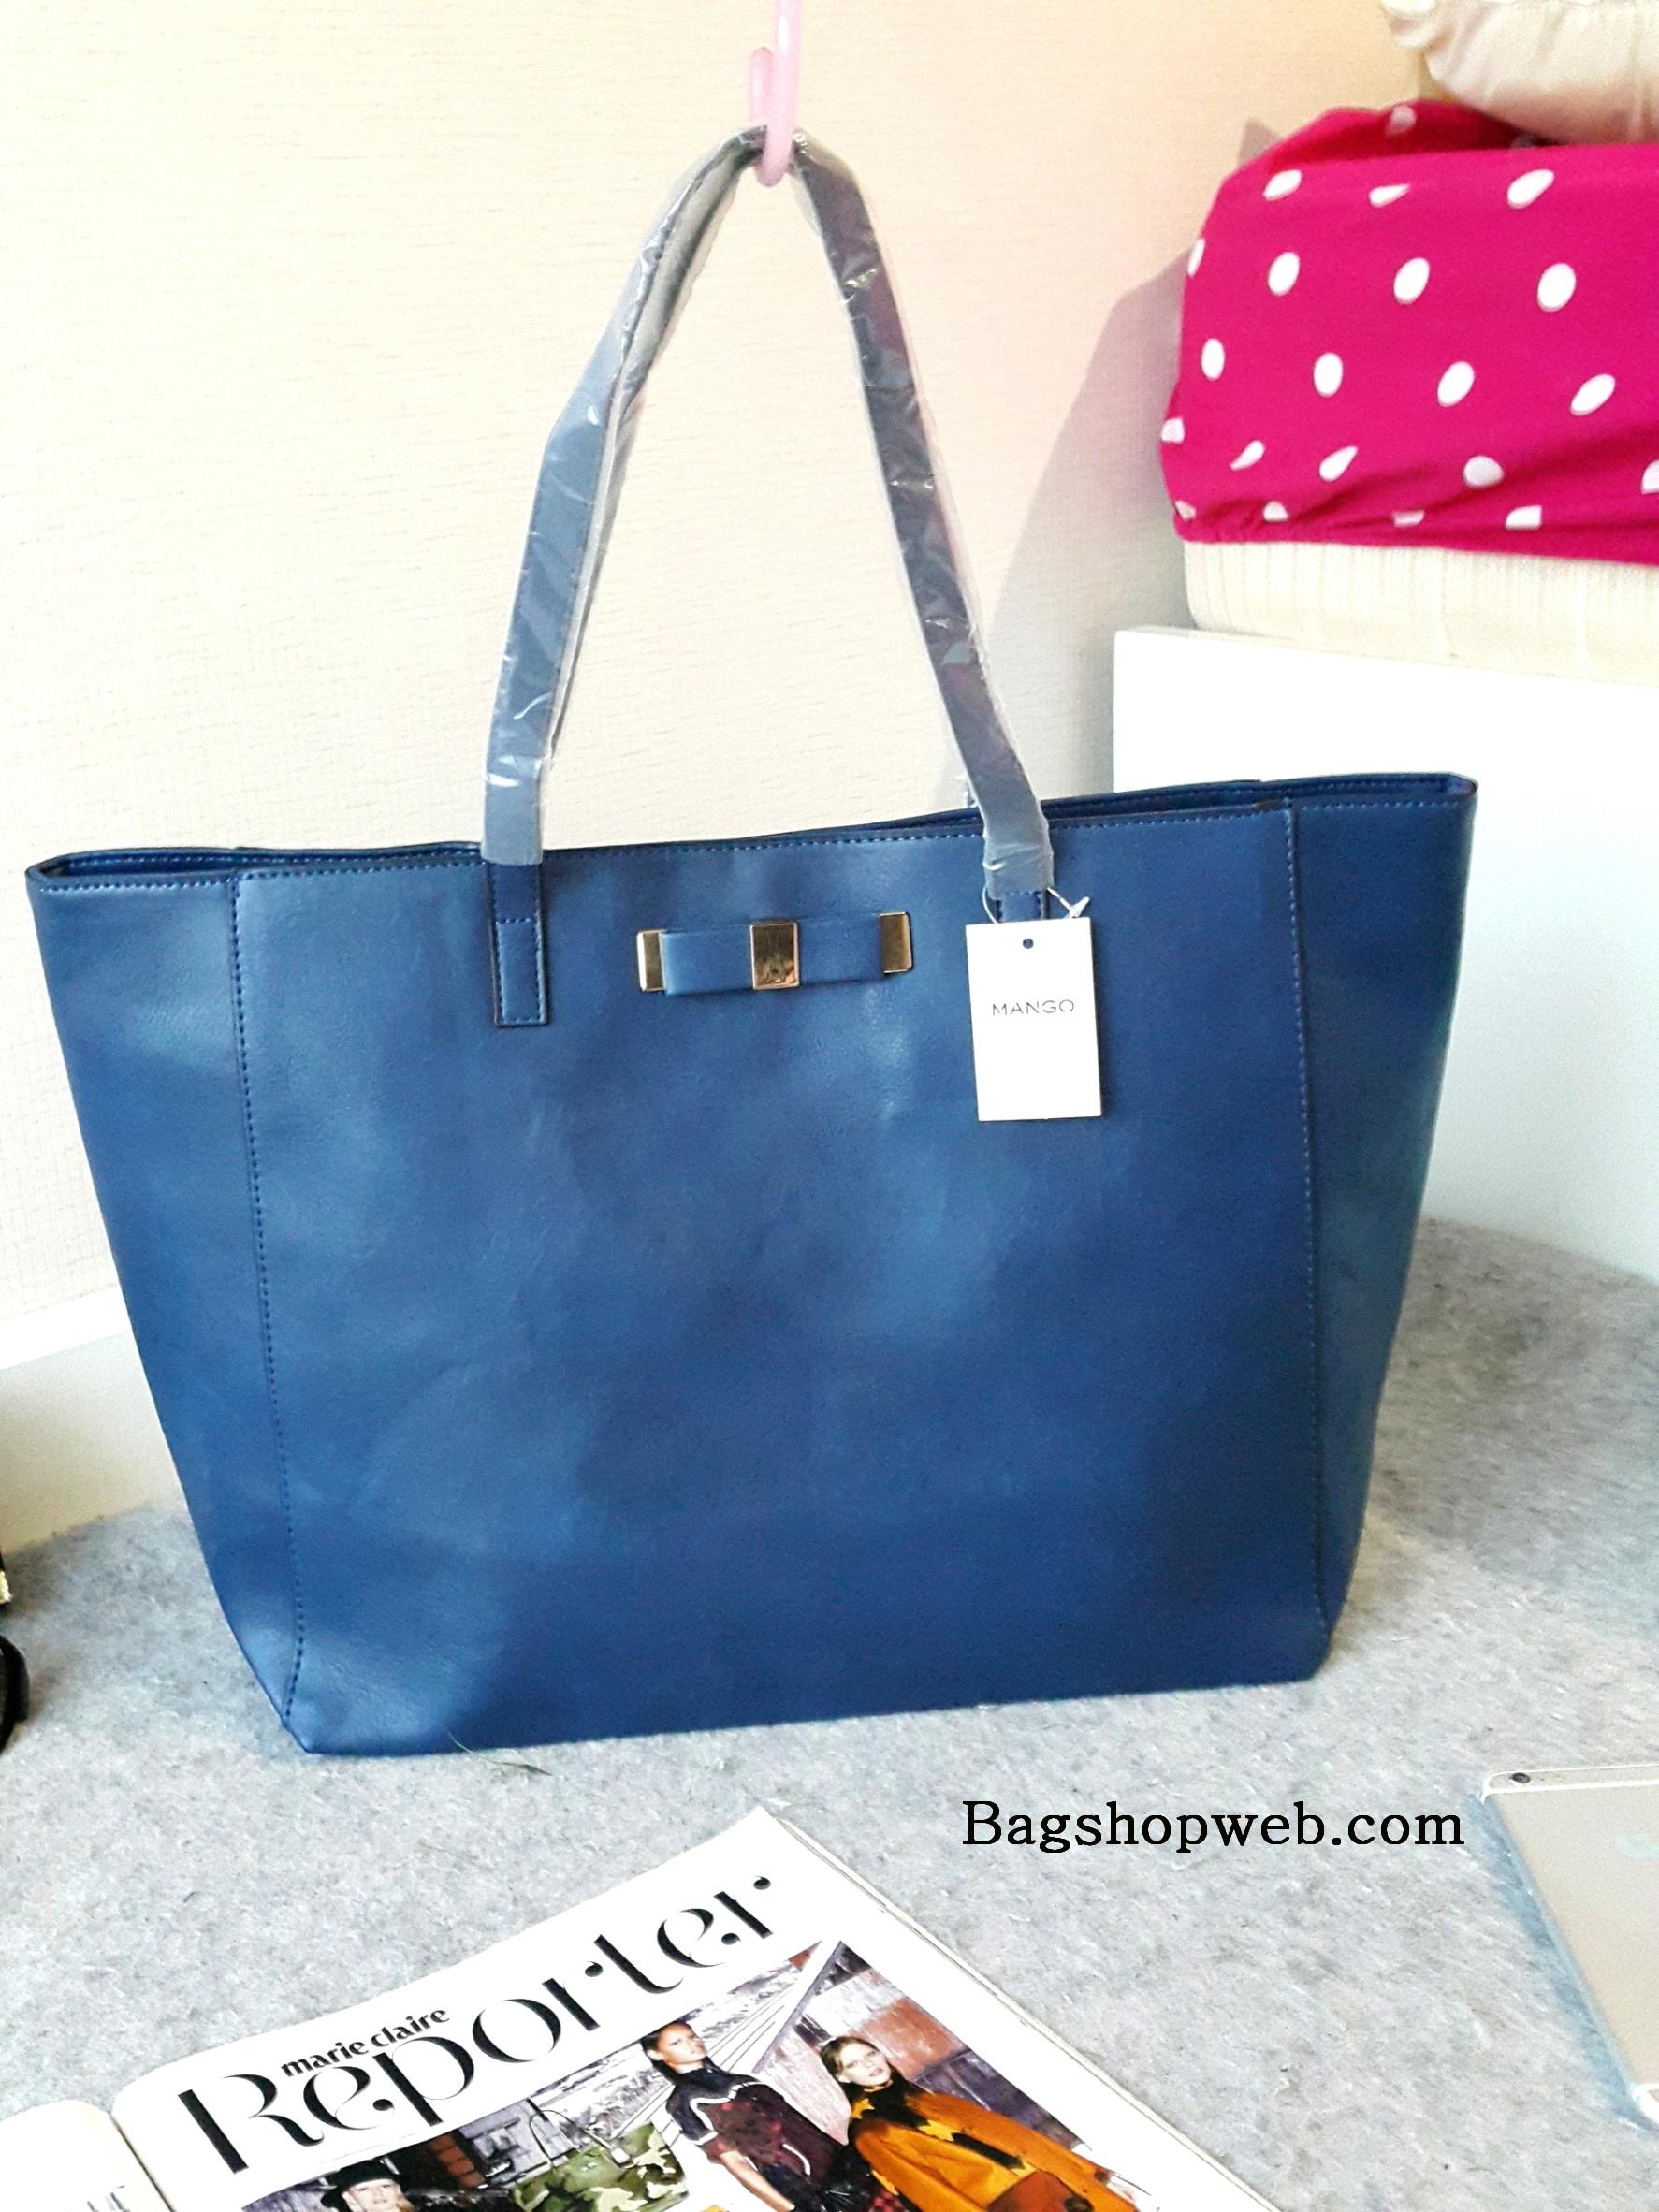 MANGO SHOPPER BAG WITH BOW DETAIL กระเป๋าทรง Shopping หนังสุดคลาสิค ดีไซน์ เก๋ แบบ 2in1 รุ่นฮิต ยี่ห้อ Mango แท้ รุ่น Shopping Bag พร้อมส่ง